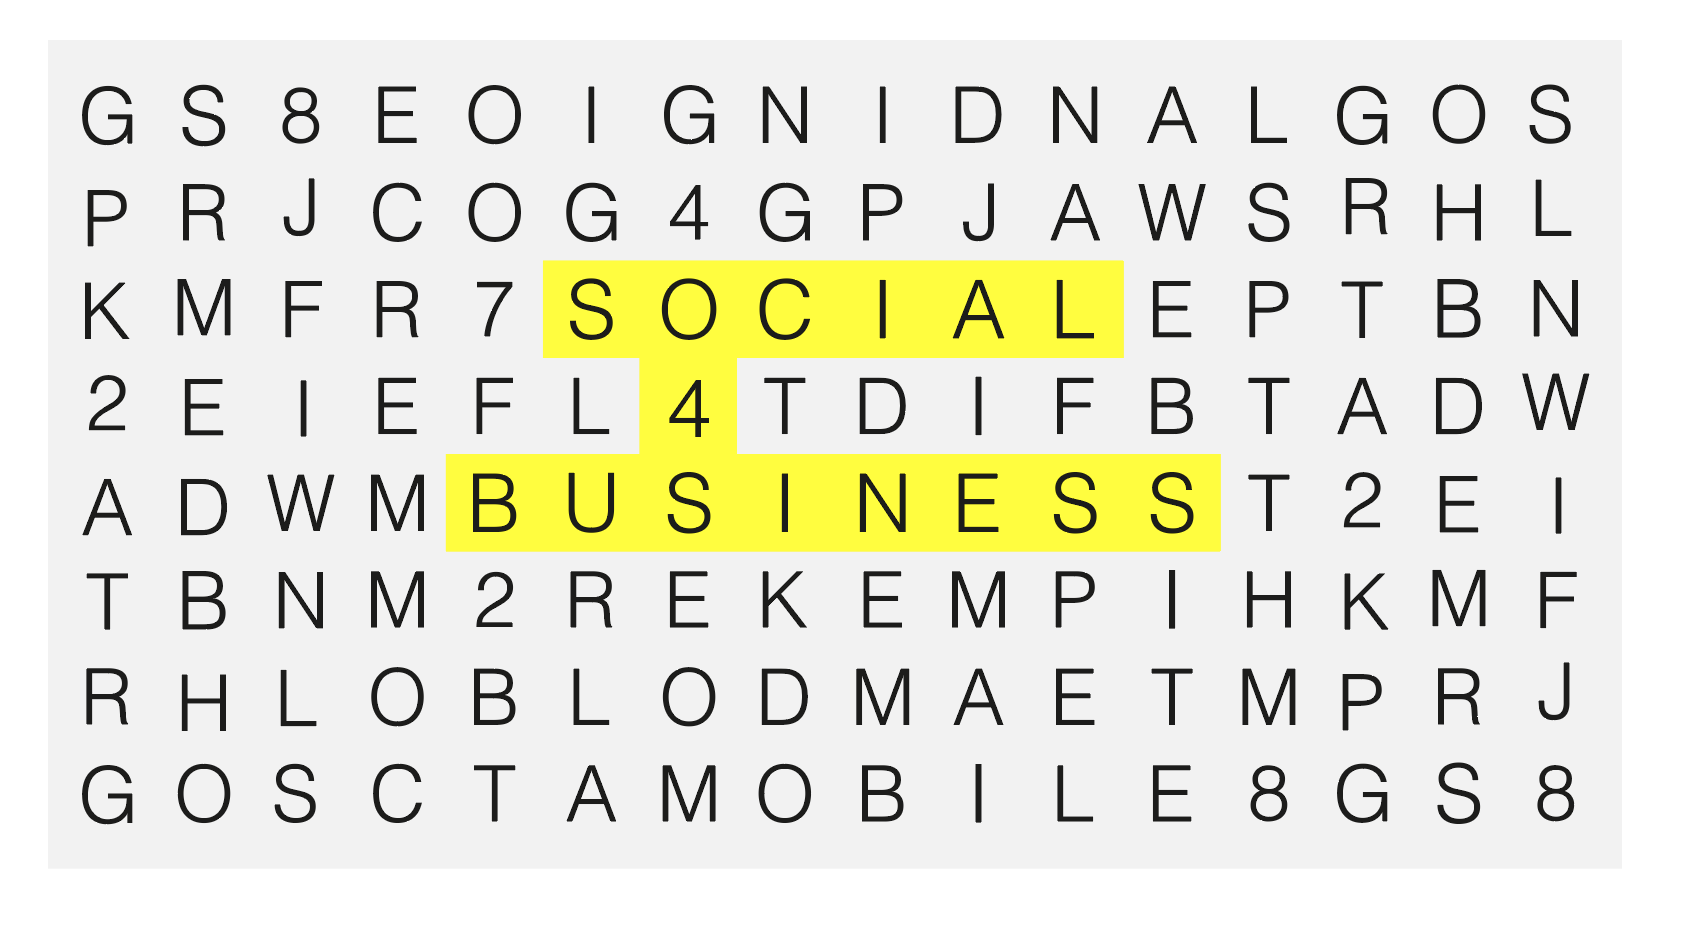 Social 4 Business